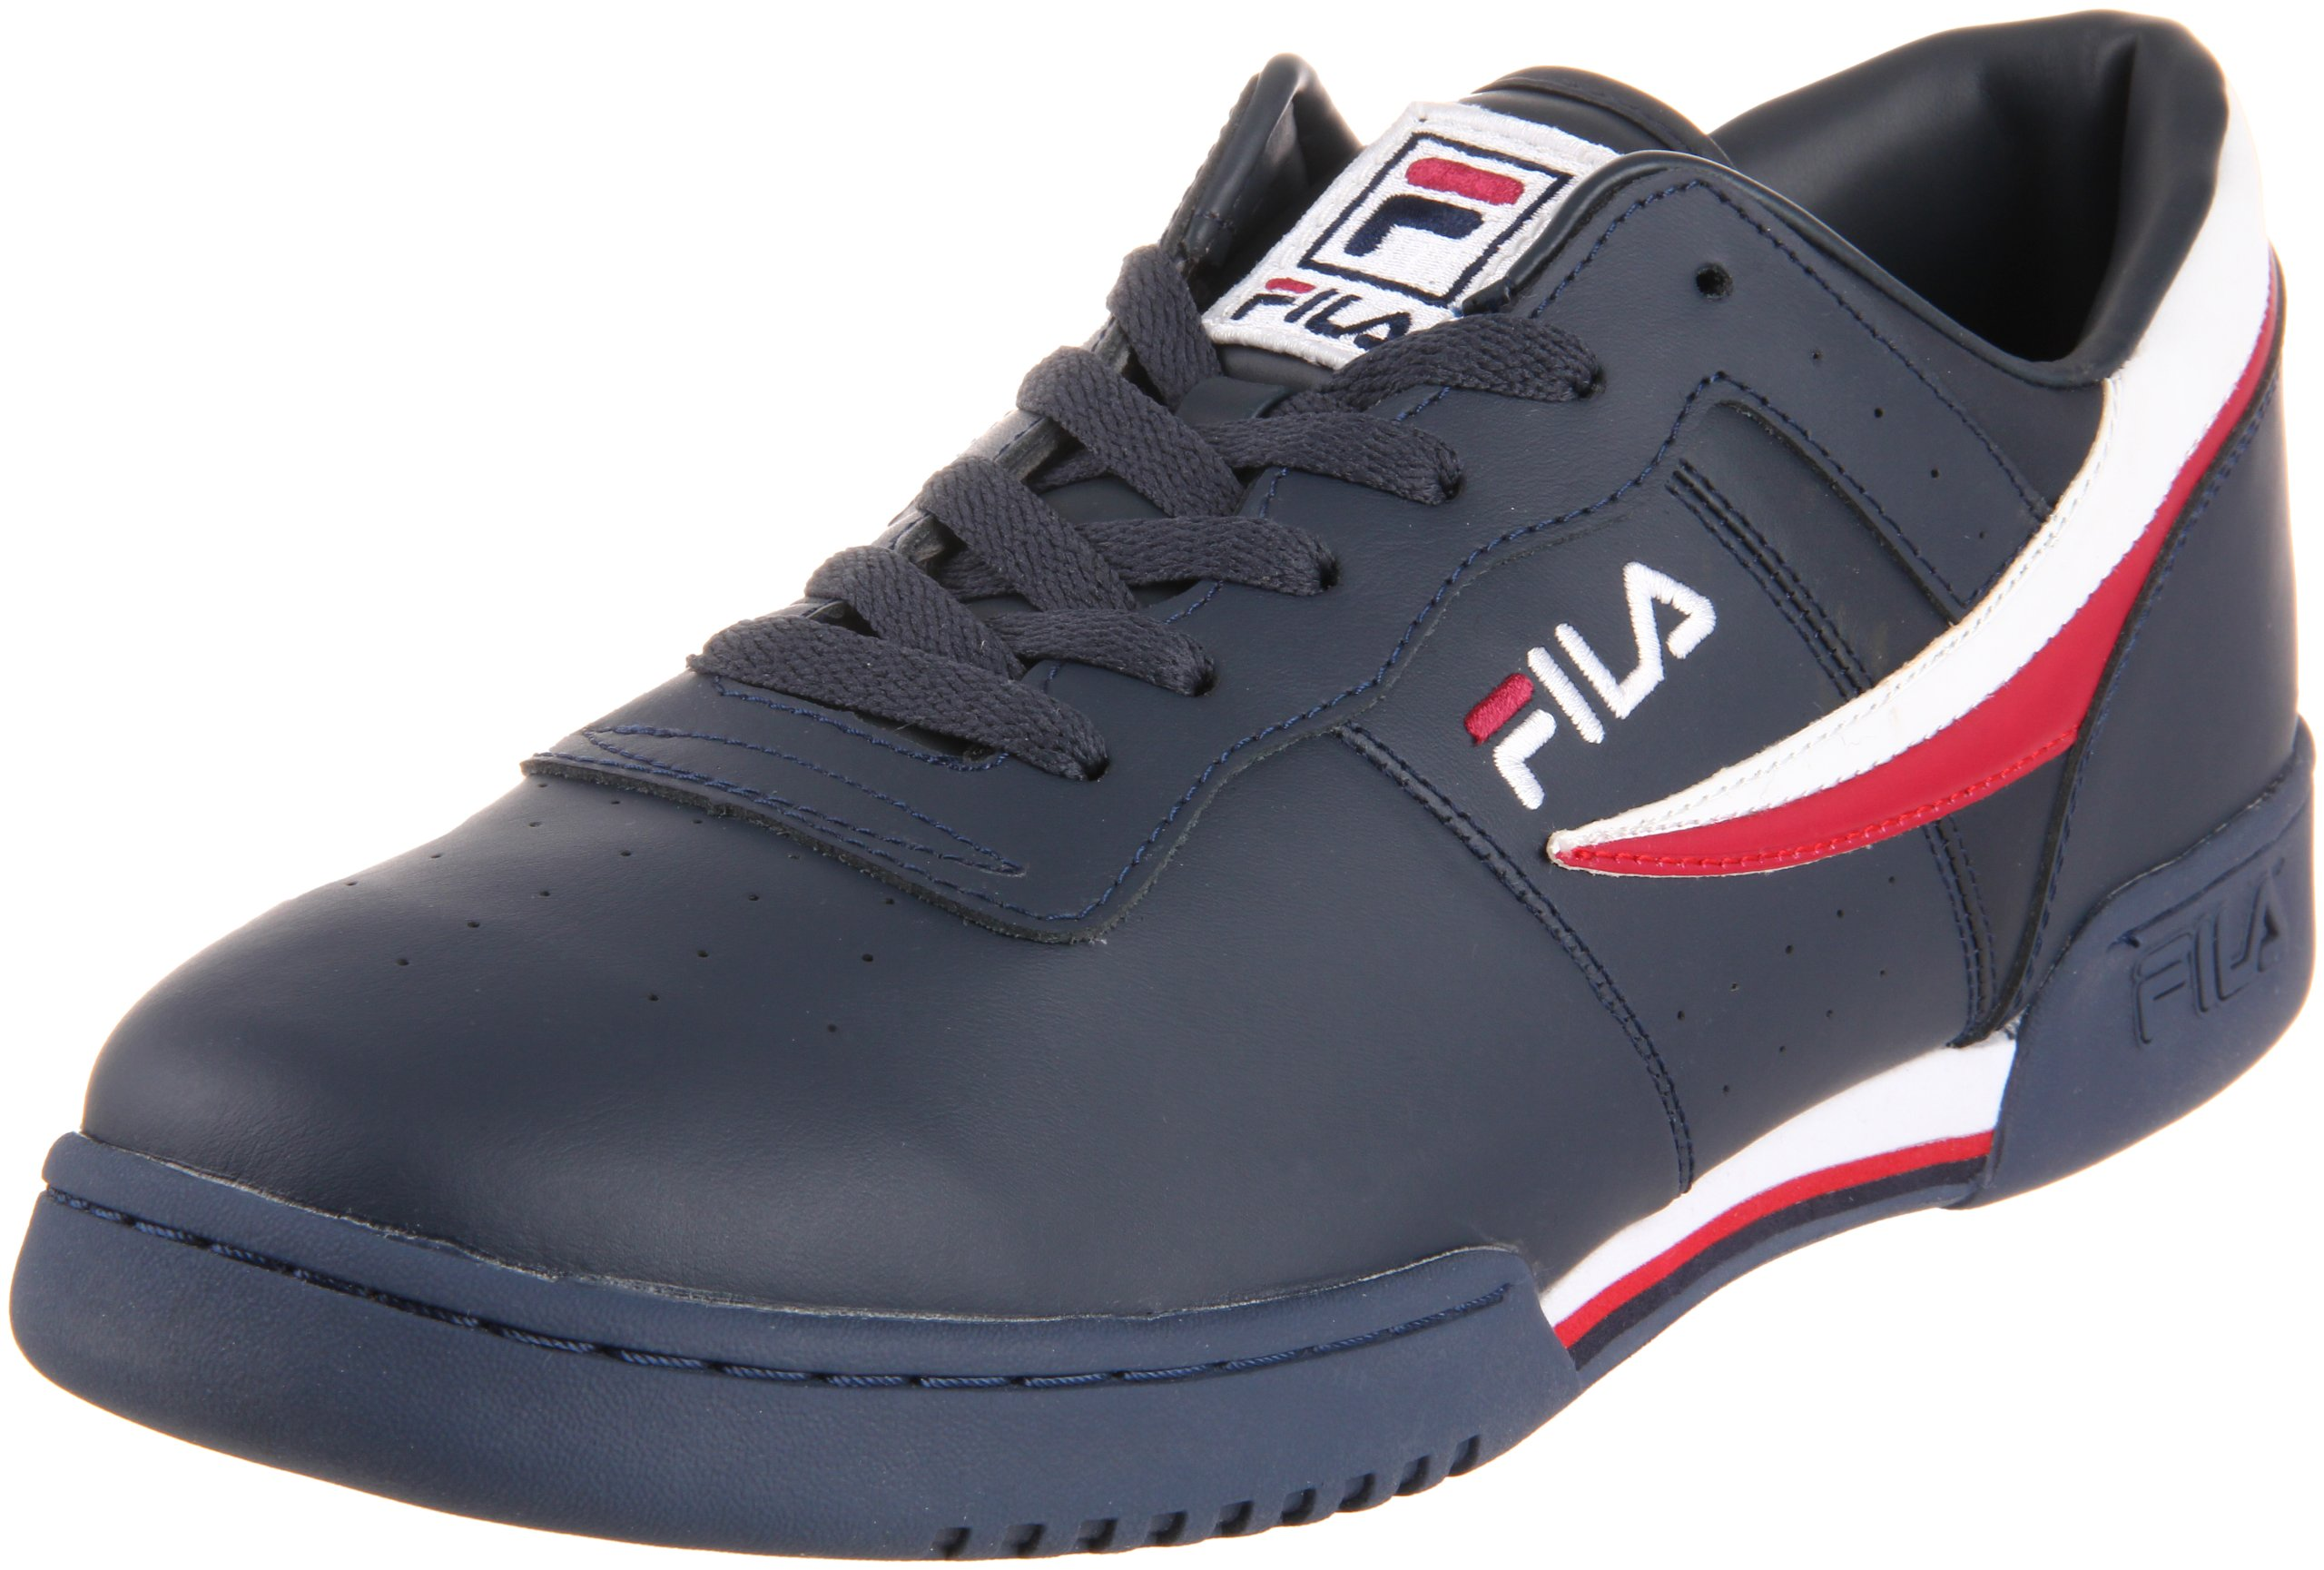 Fila Men's Original Fitness, Navy/White/Red, 6.5 M US